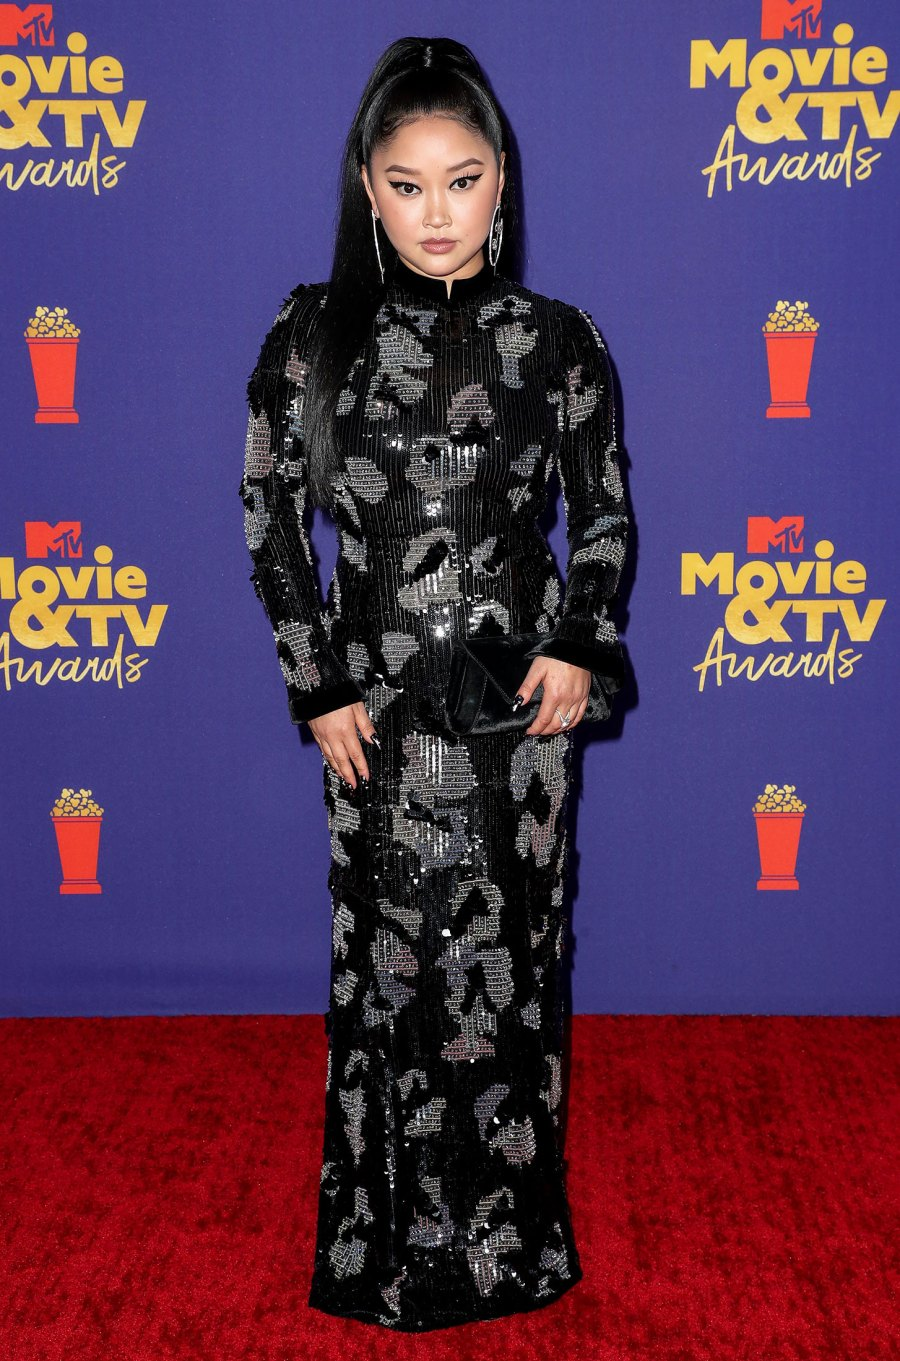 MTV Movie & TV Awards Red Carpet Arrivals - Lana Condor